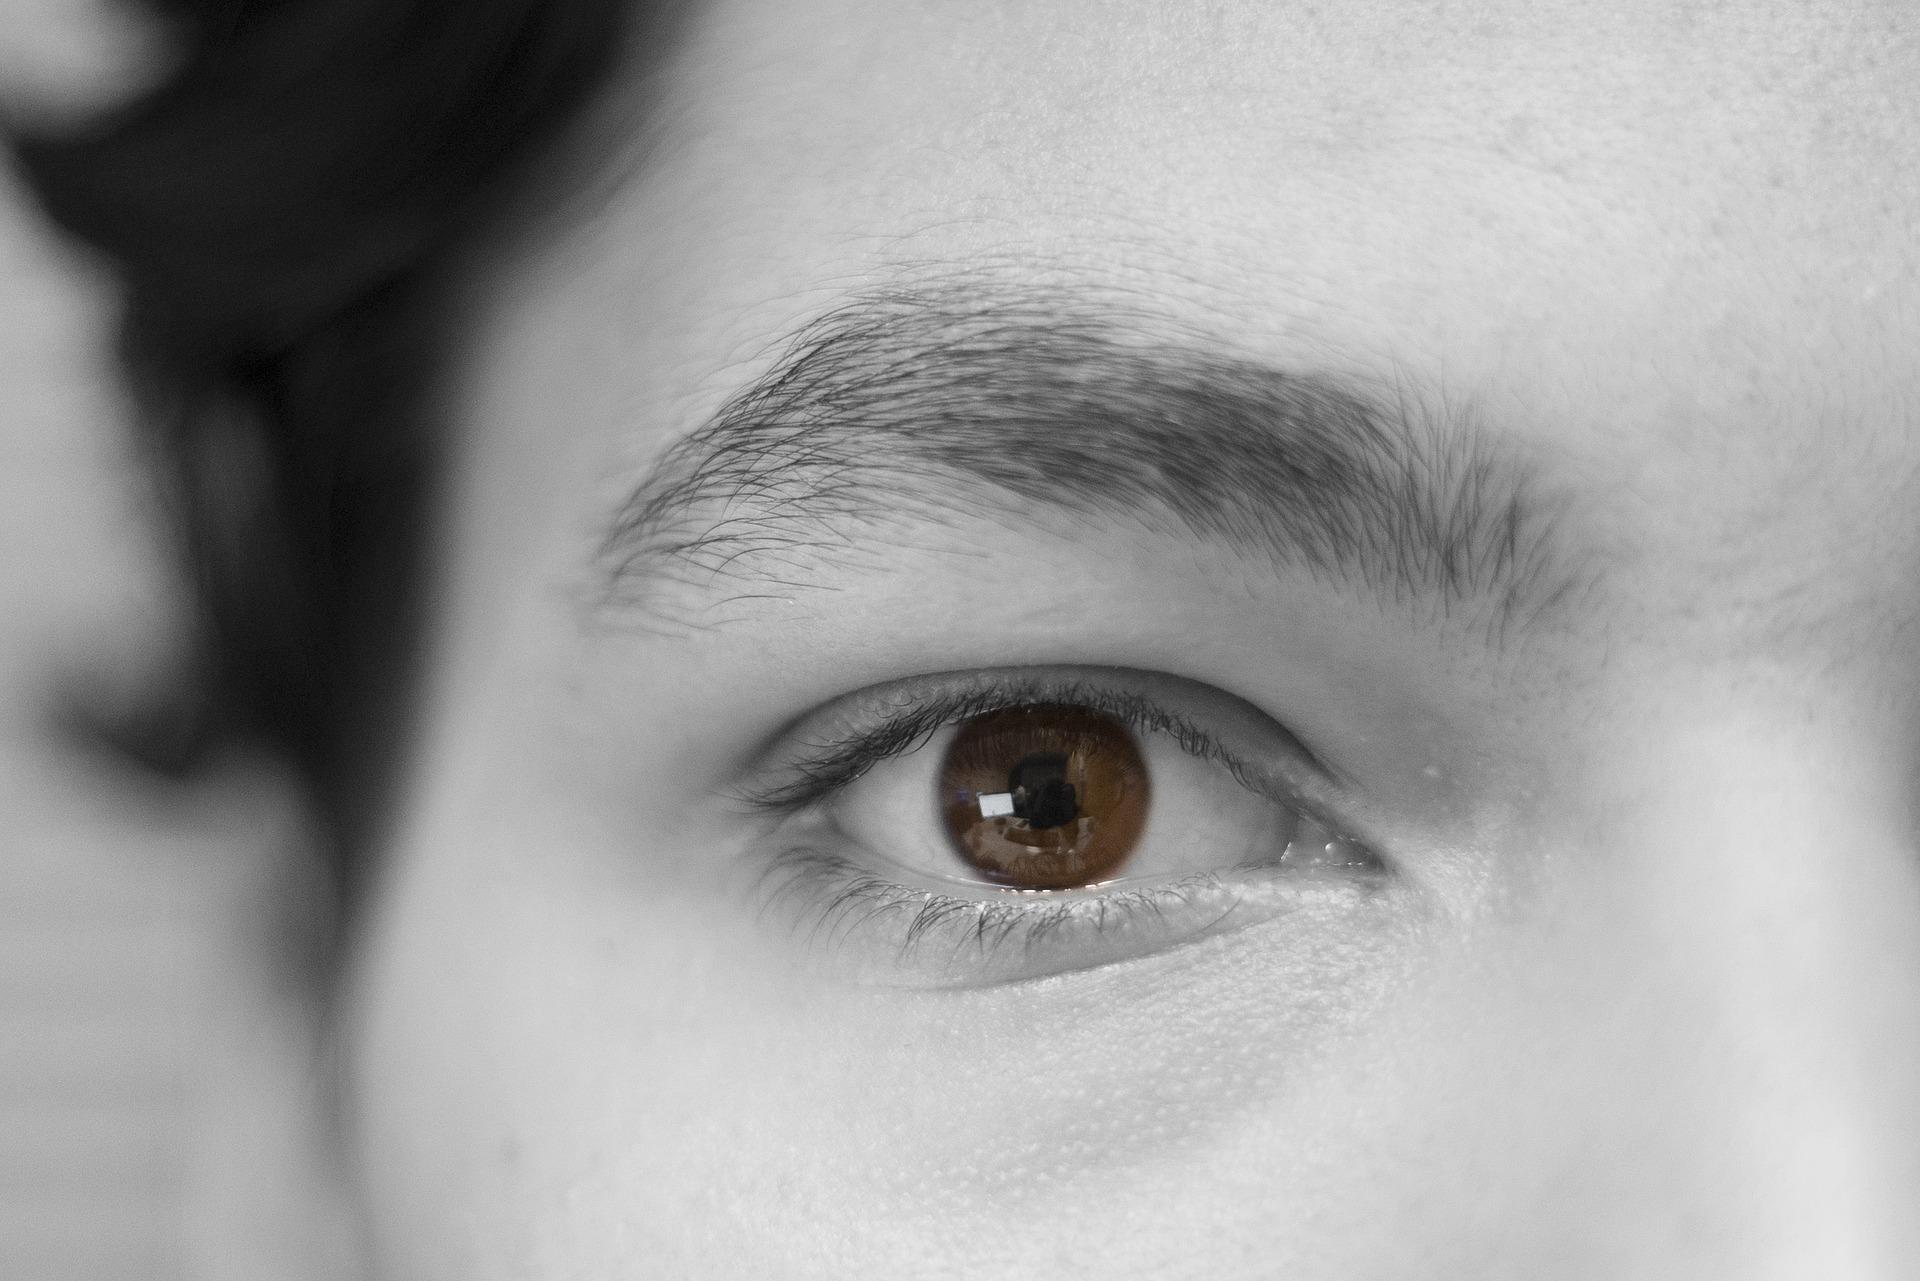 Ojo al desprendimiento de retina